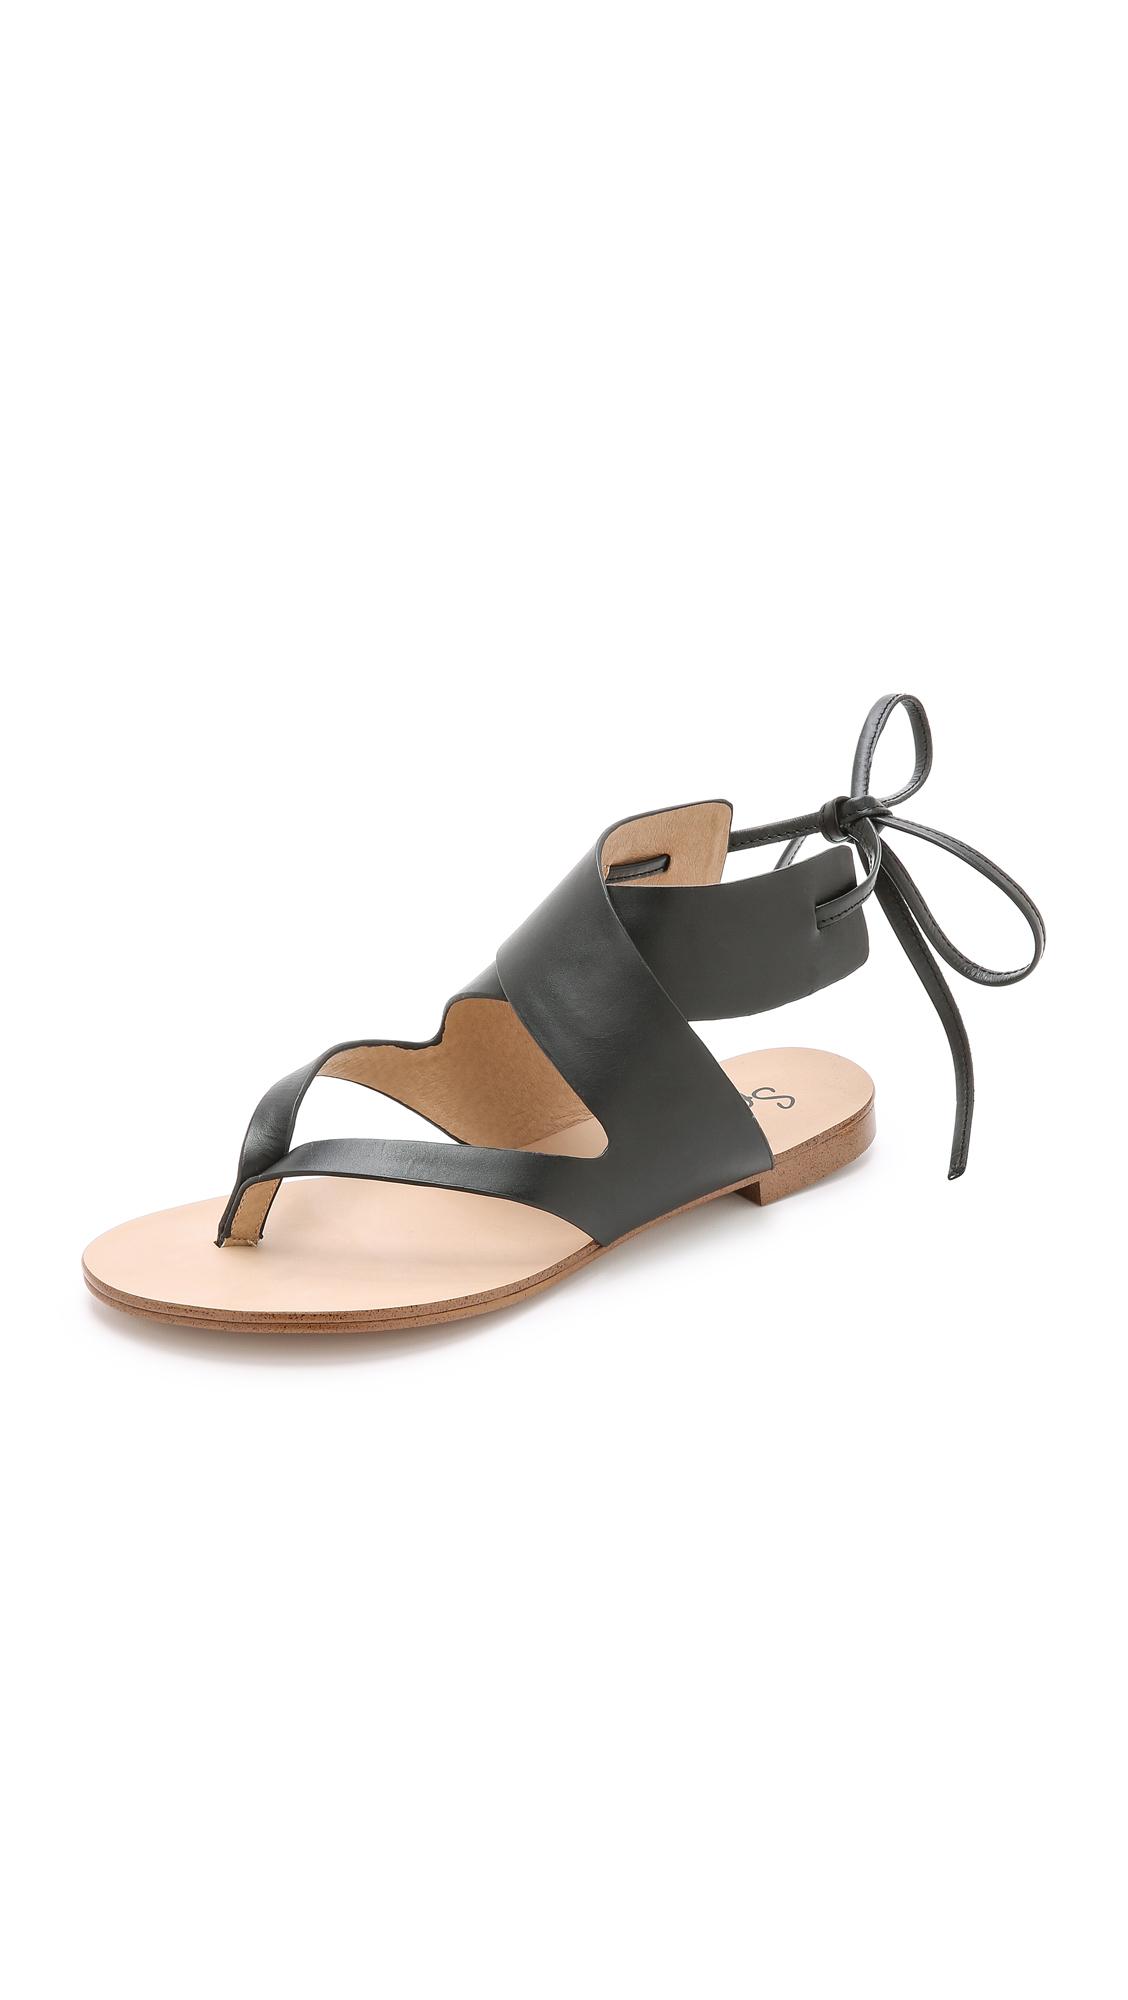 Splendid Camdyn Flat Sandals Nude In Black Lyst